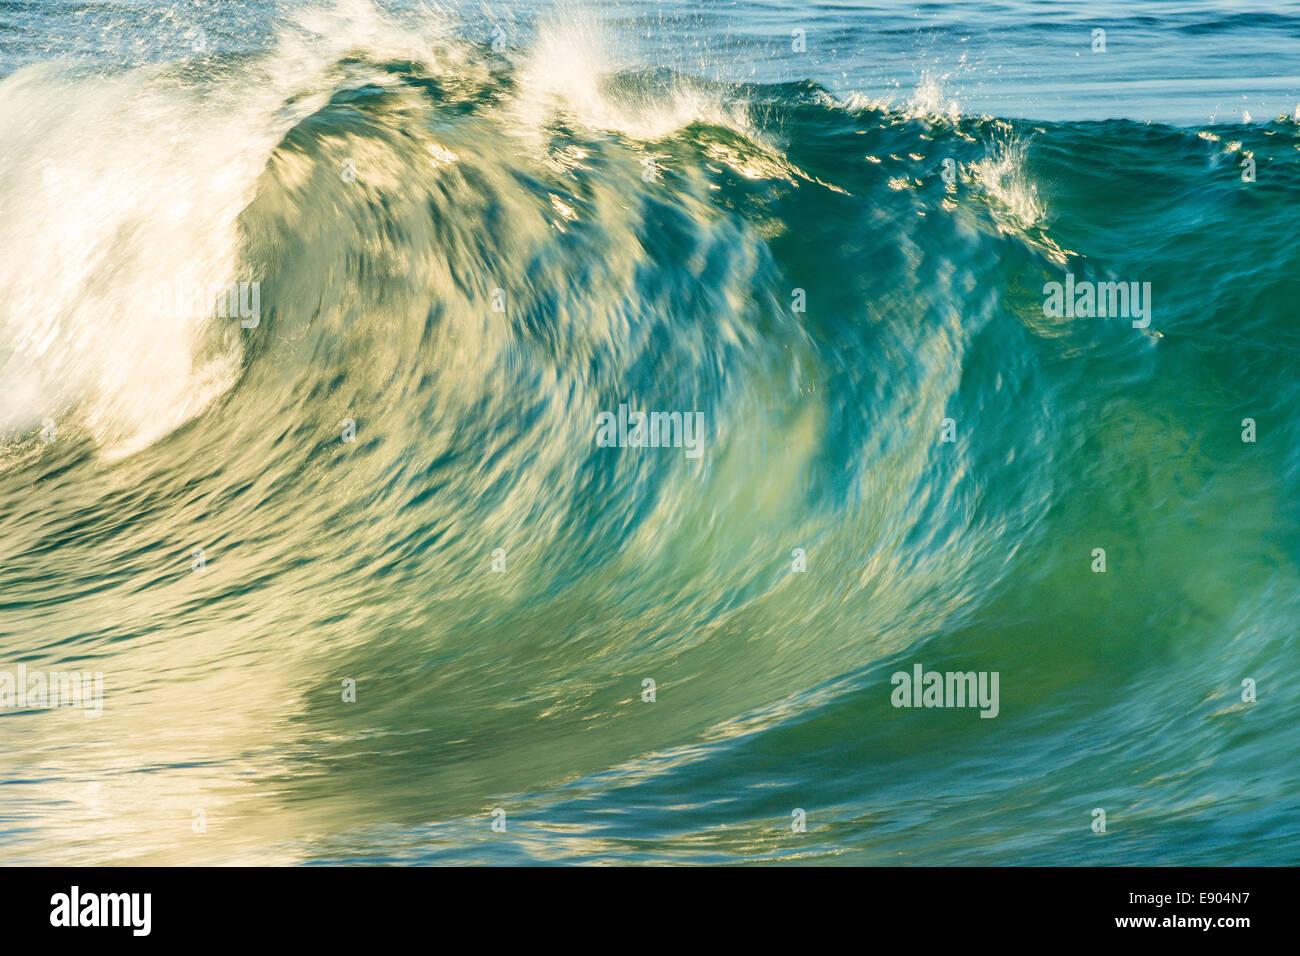 Breaking wave, Adder Rock, North Stradbroke Island, Queensland, Australia - Stock Image